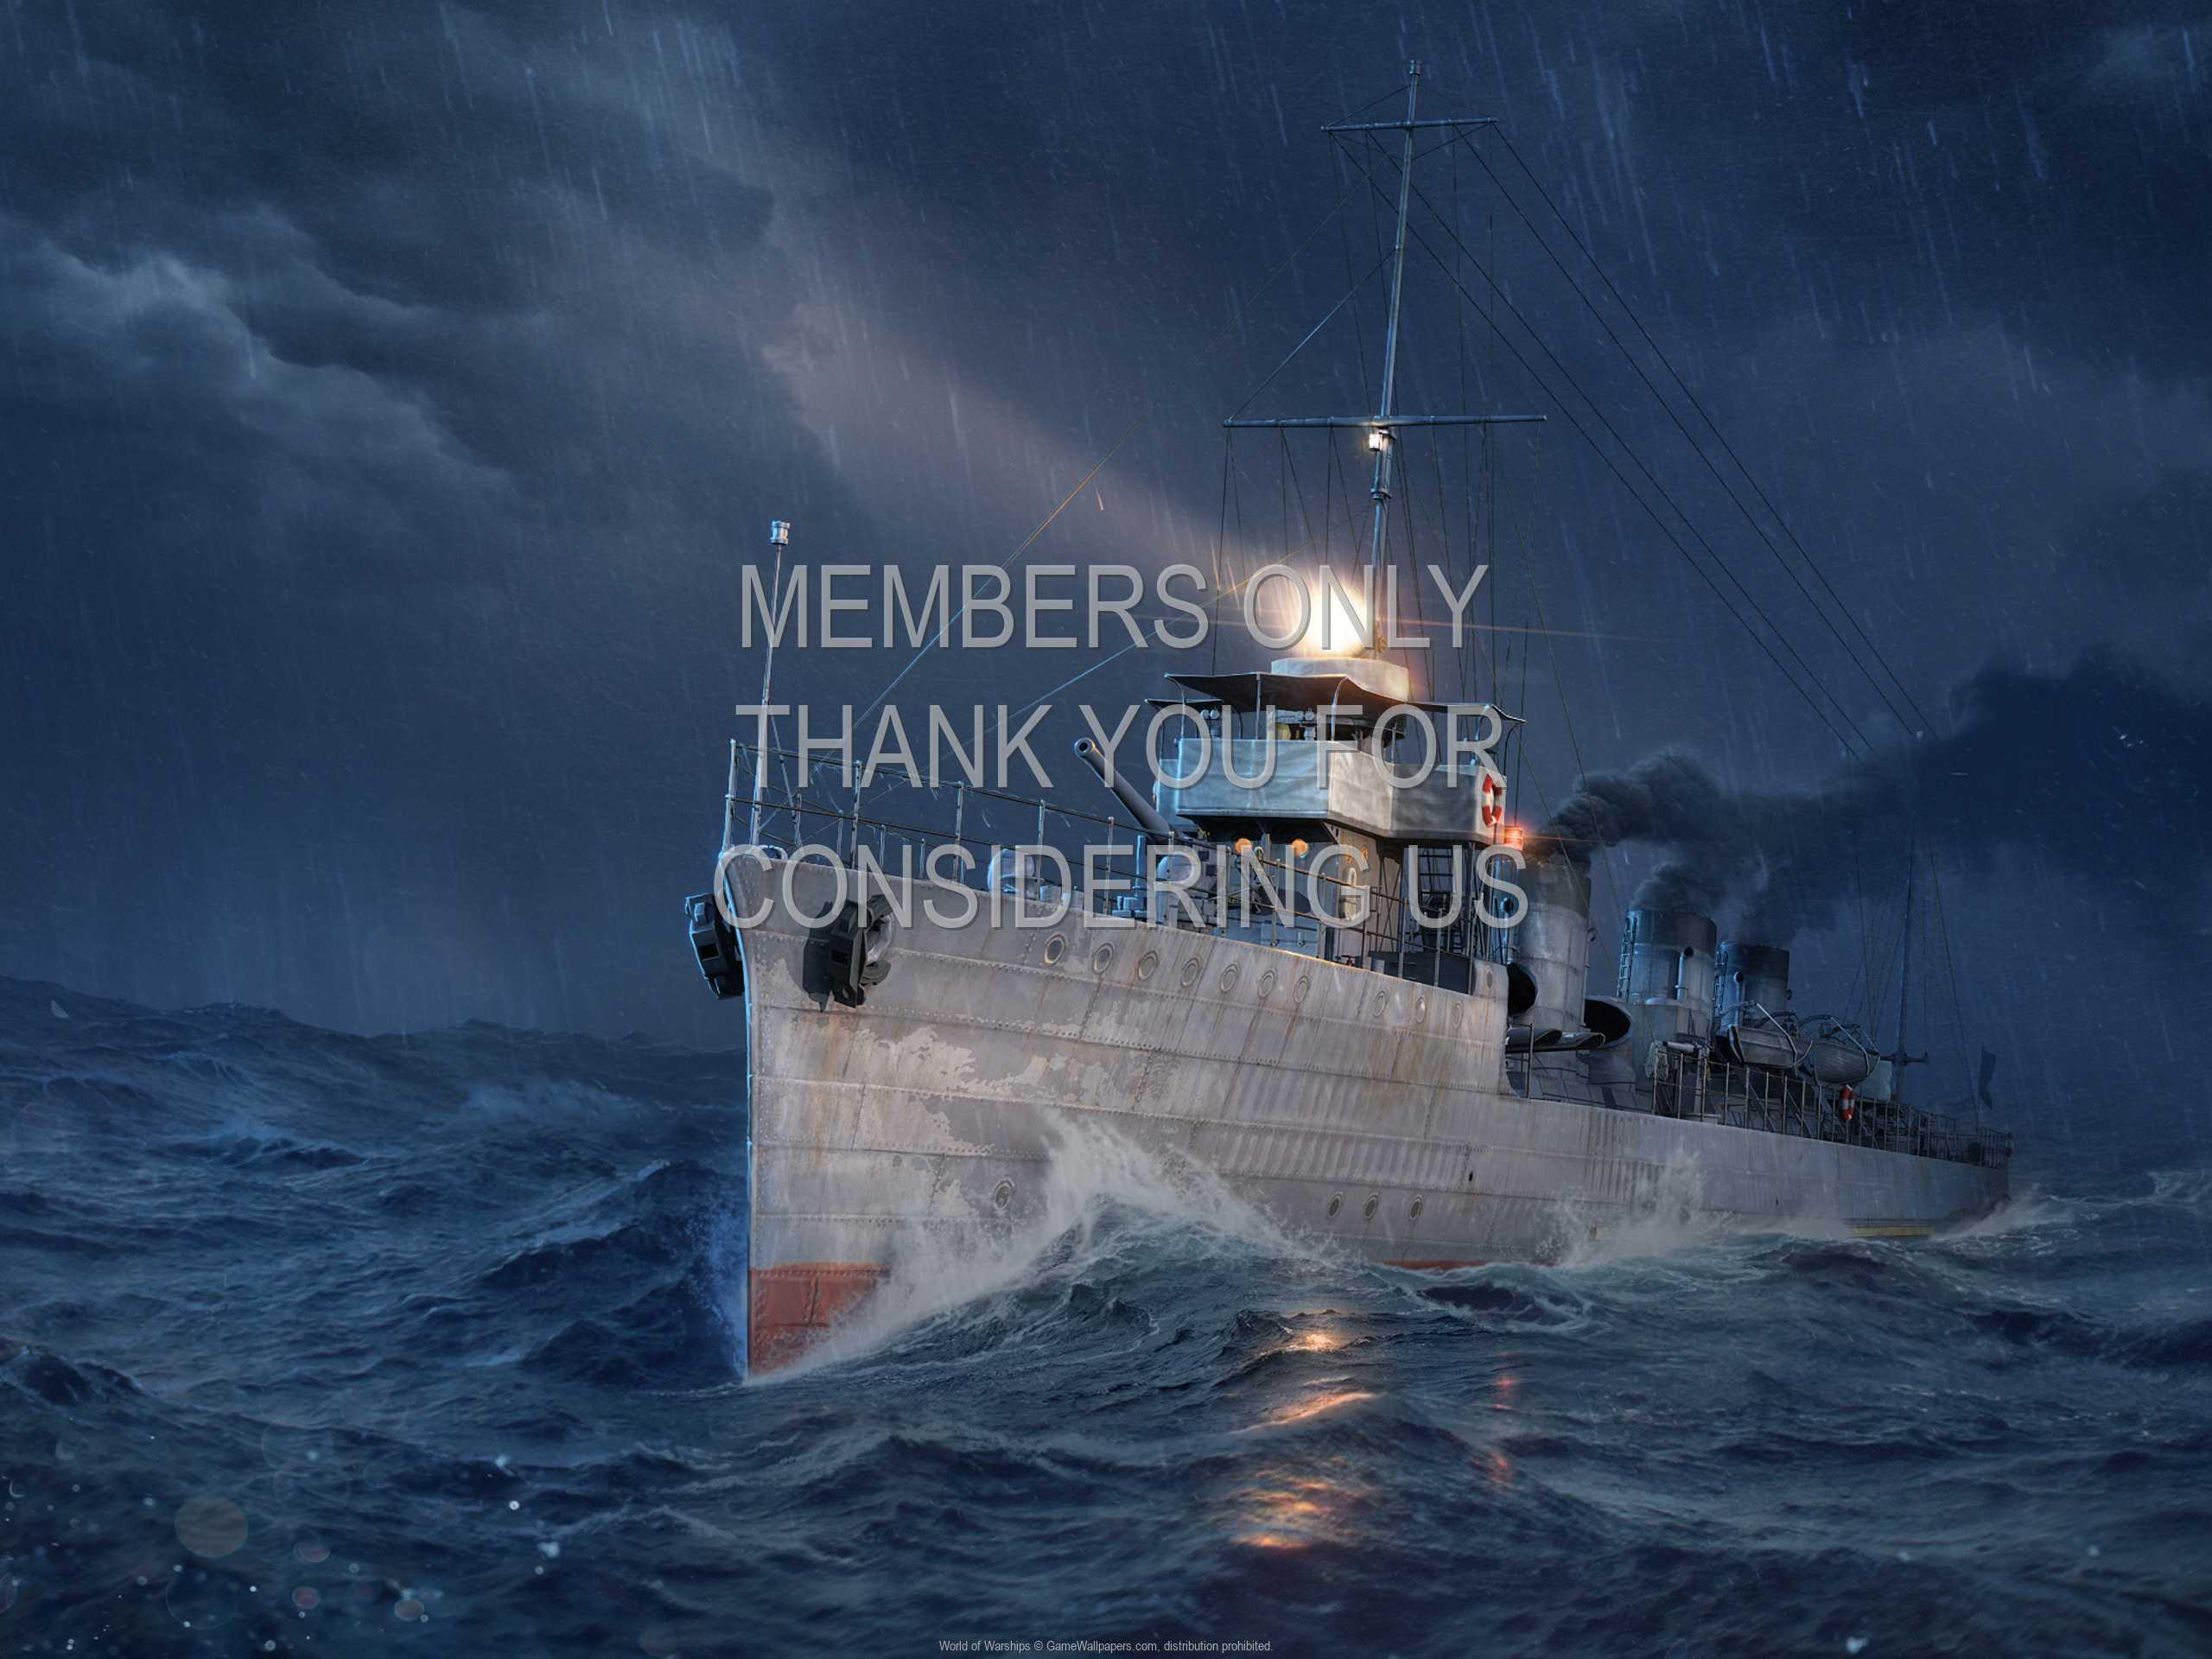 World of Warships 1080p Horizontal Mobile fond d'écran 08